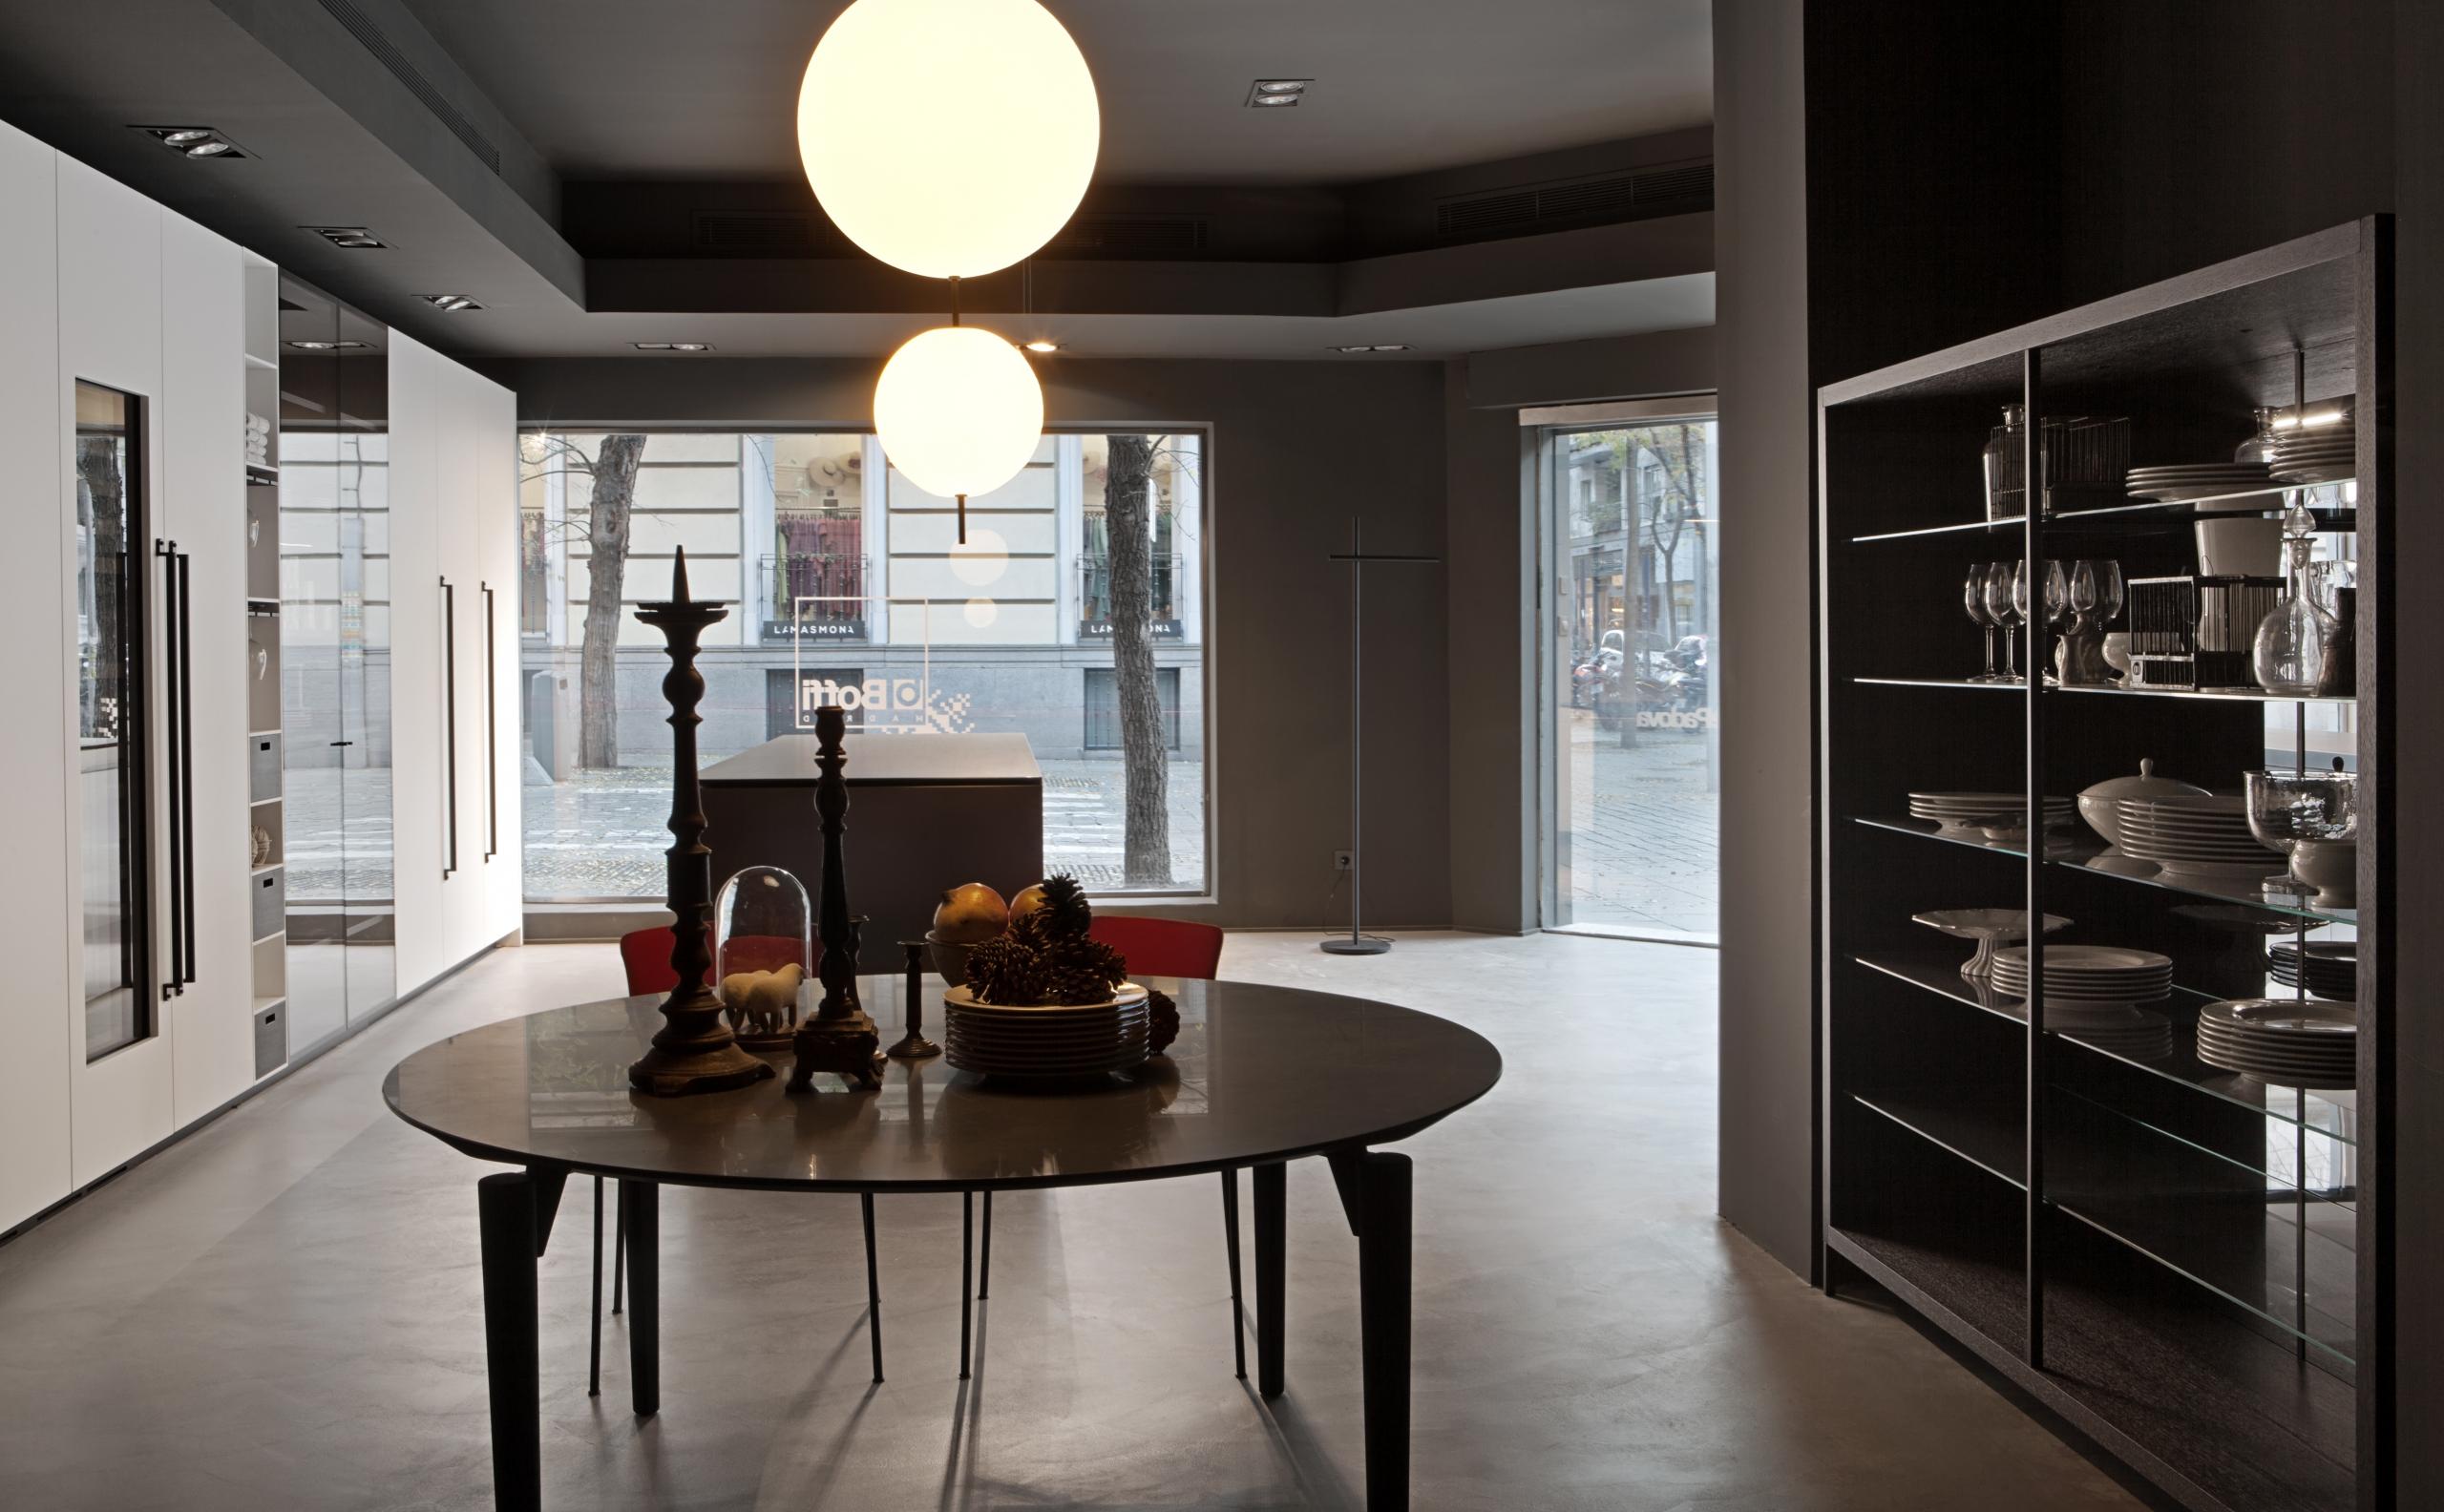 Boffi DePadova News: Boffi | De Padova opens the doors to a new design space in Madrid 3